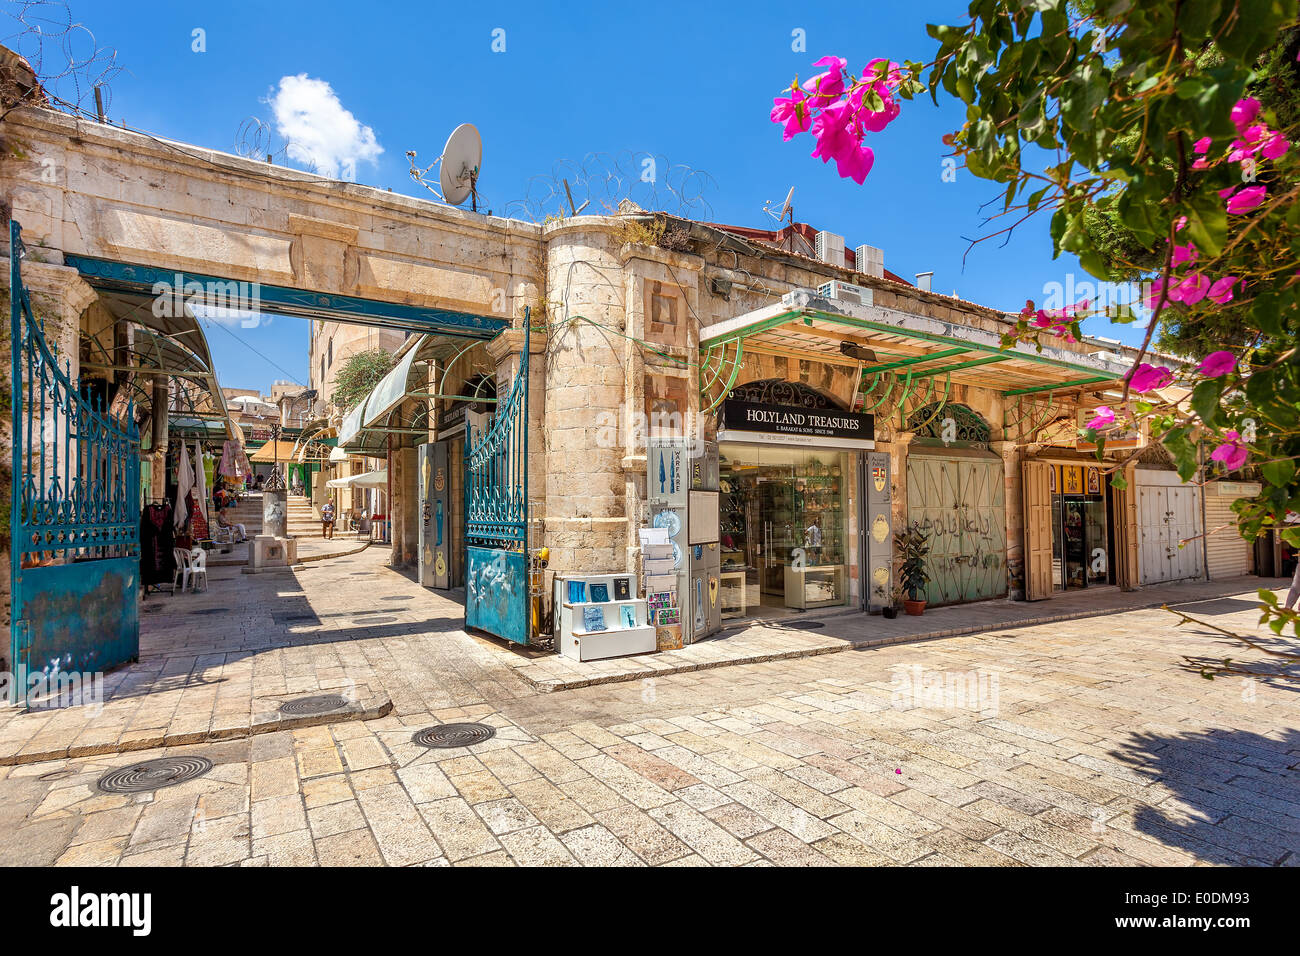 Alten Basar in Jerusalem, Israel. Stockbild